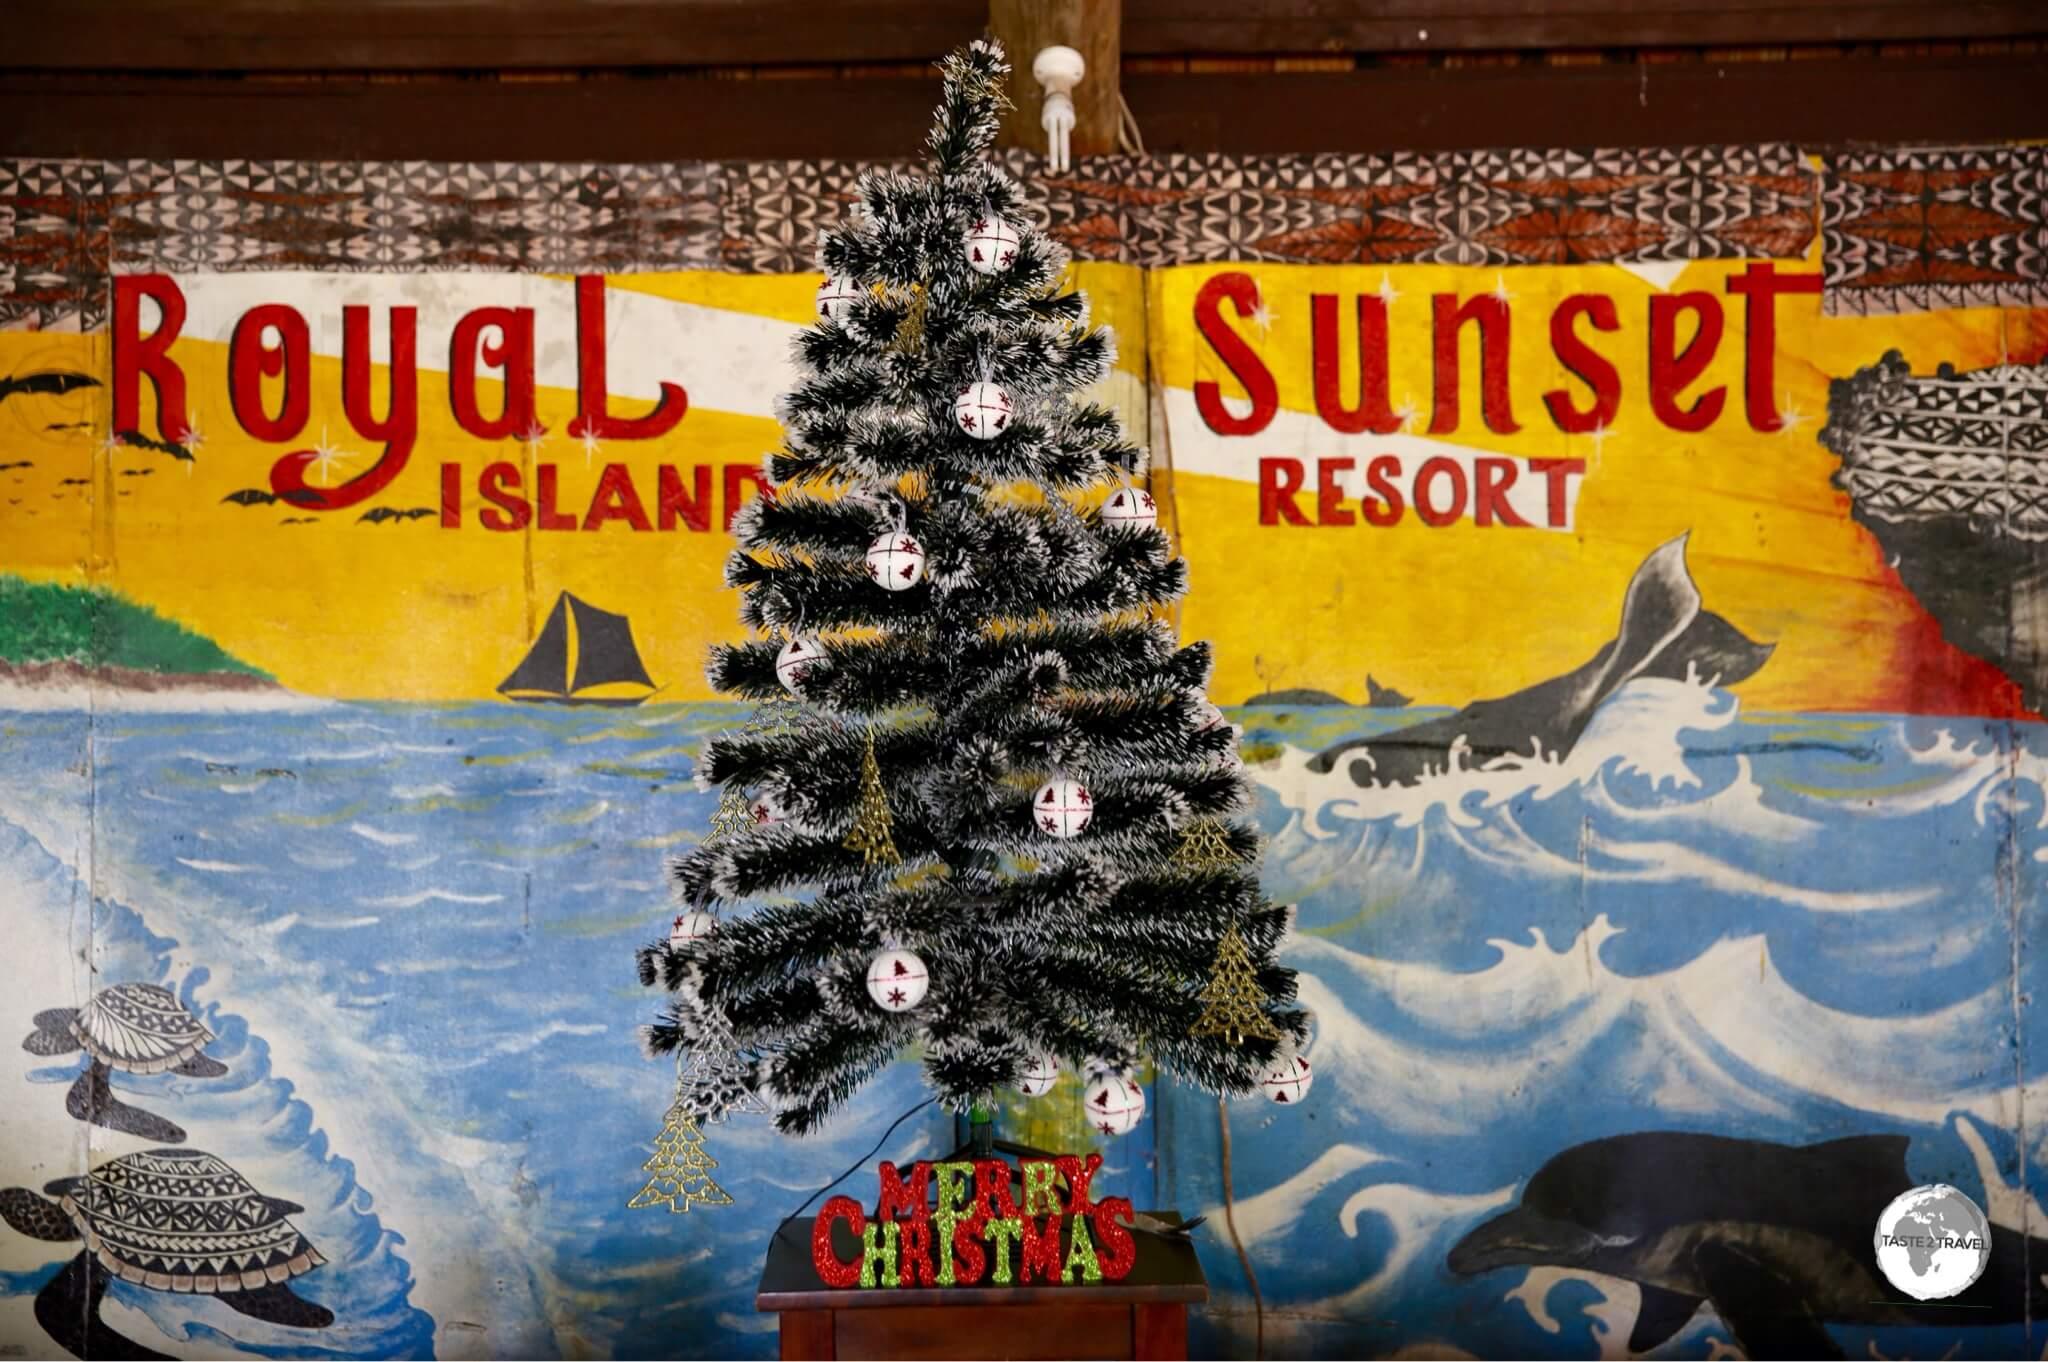 Christmas decorations at the Royal Sunset Island resort on 'Atata island.